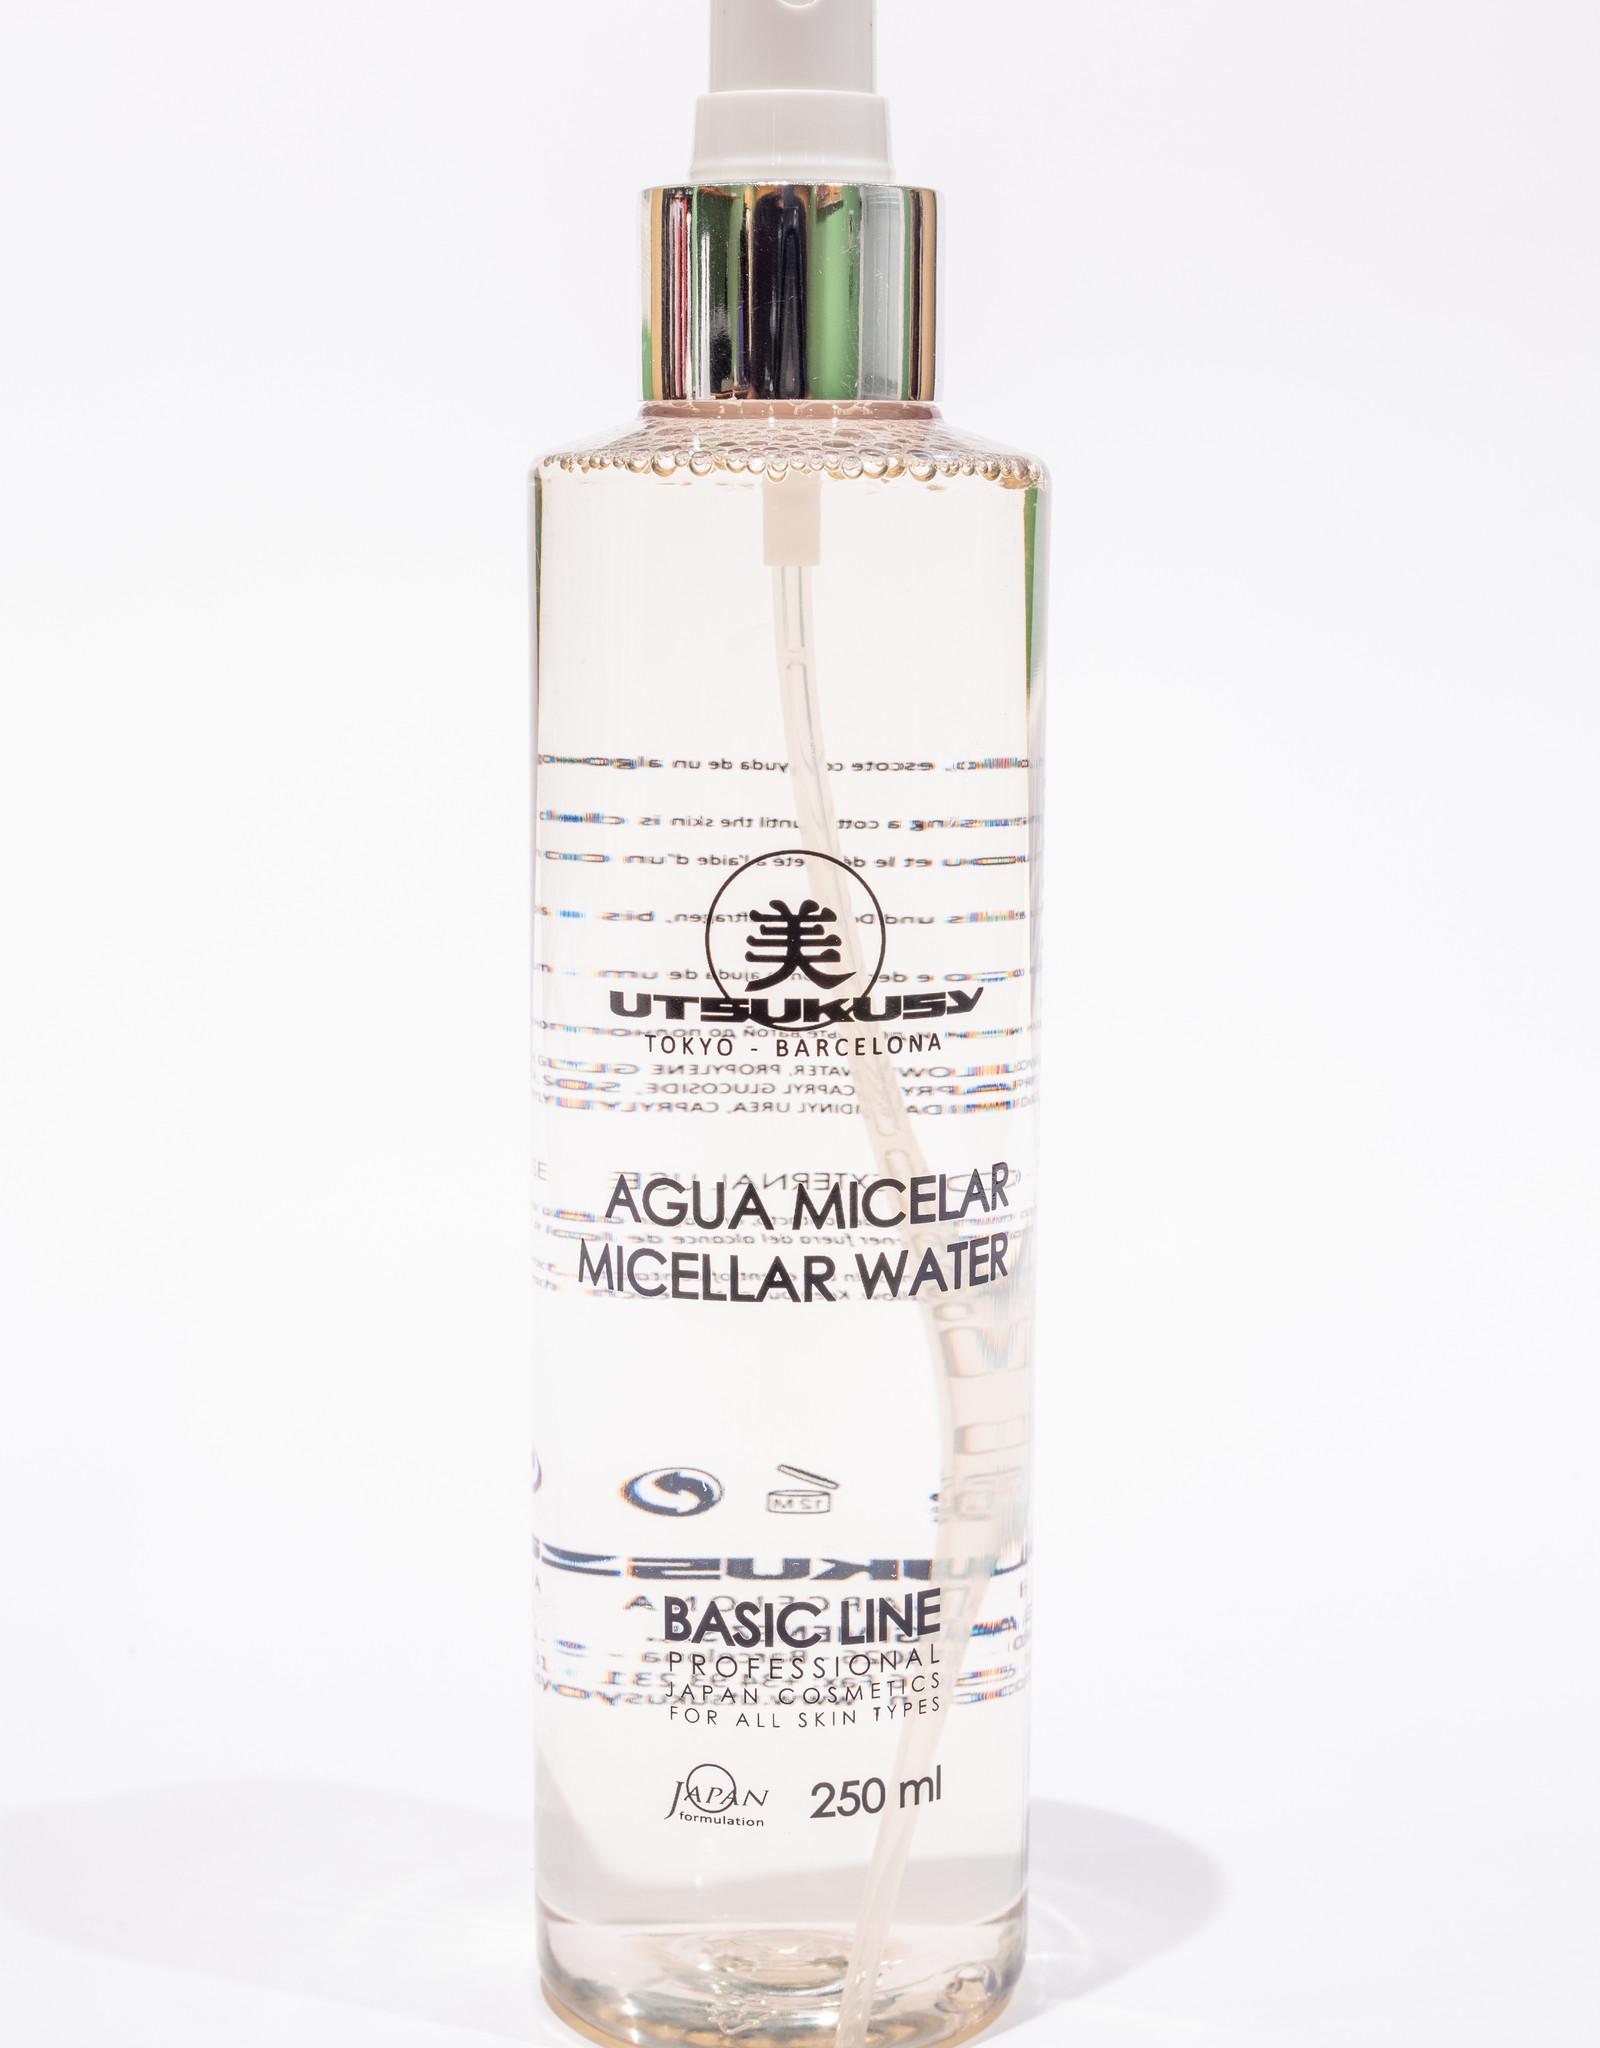 Utsukusy Micellair water toner lotion